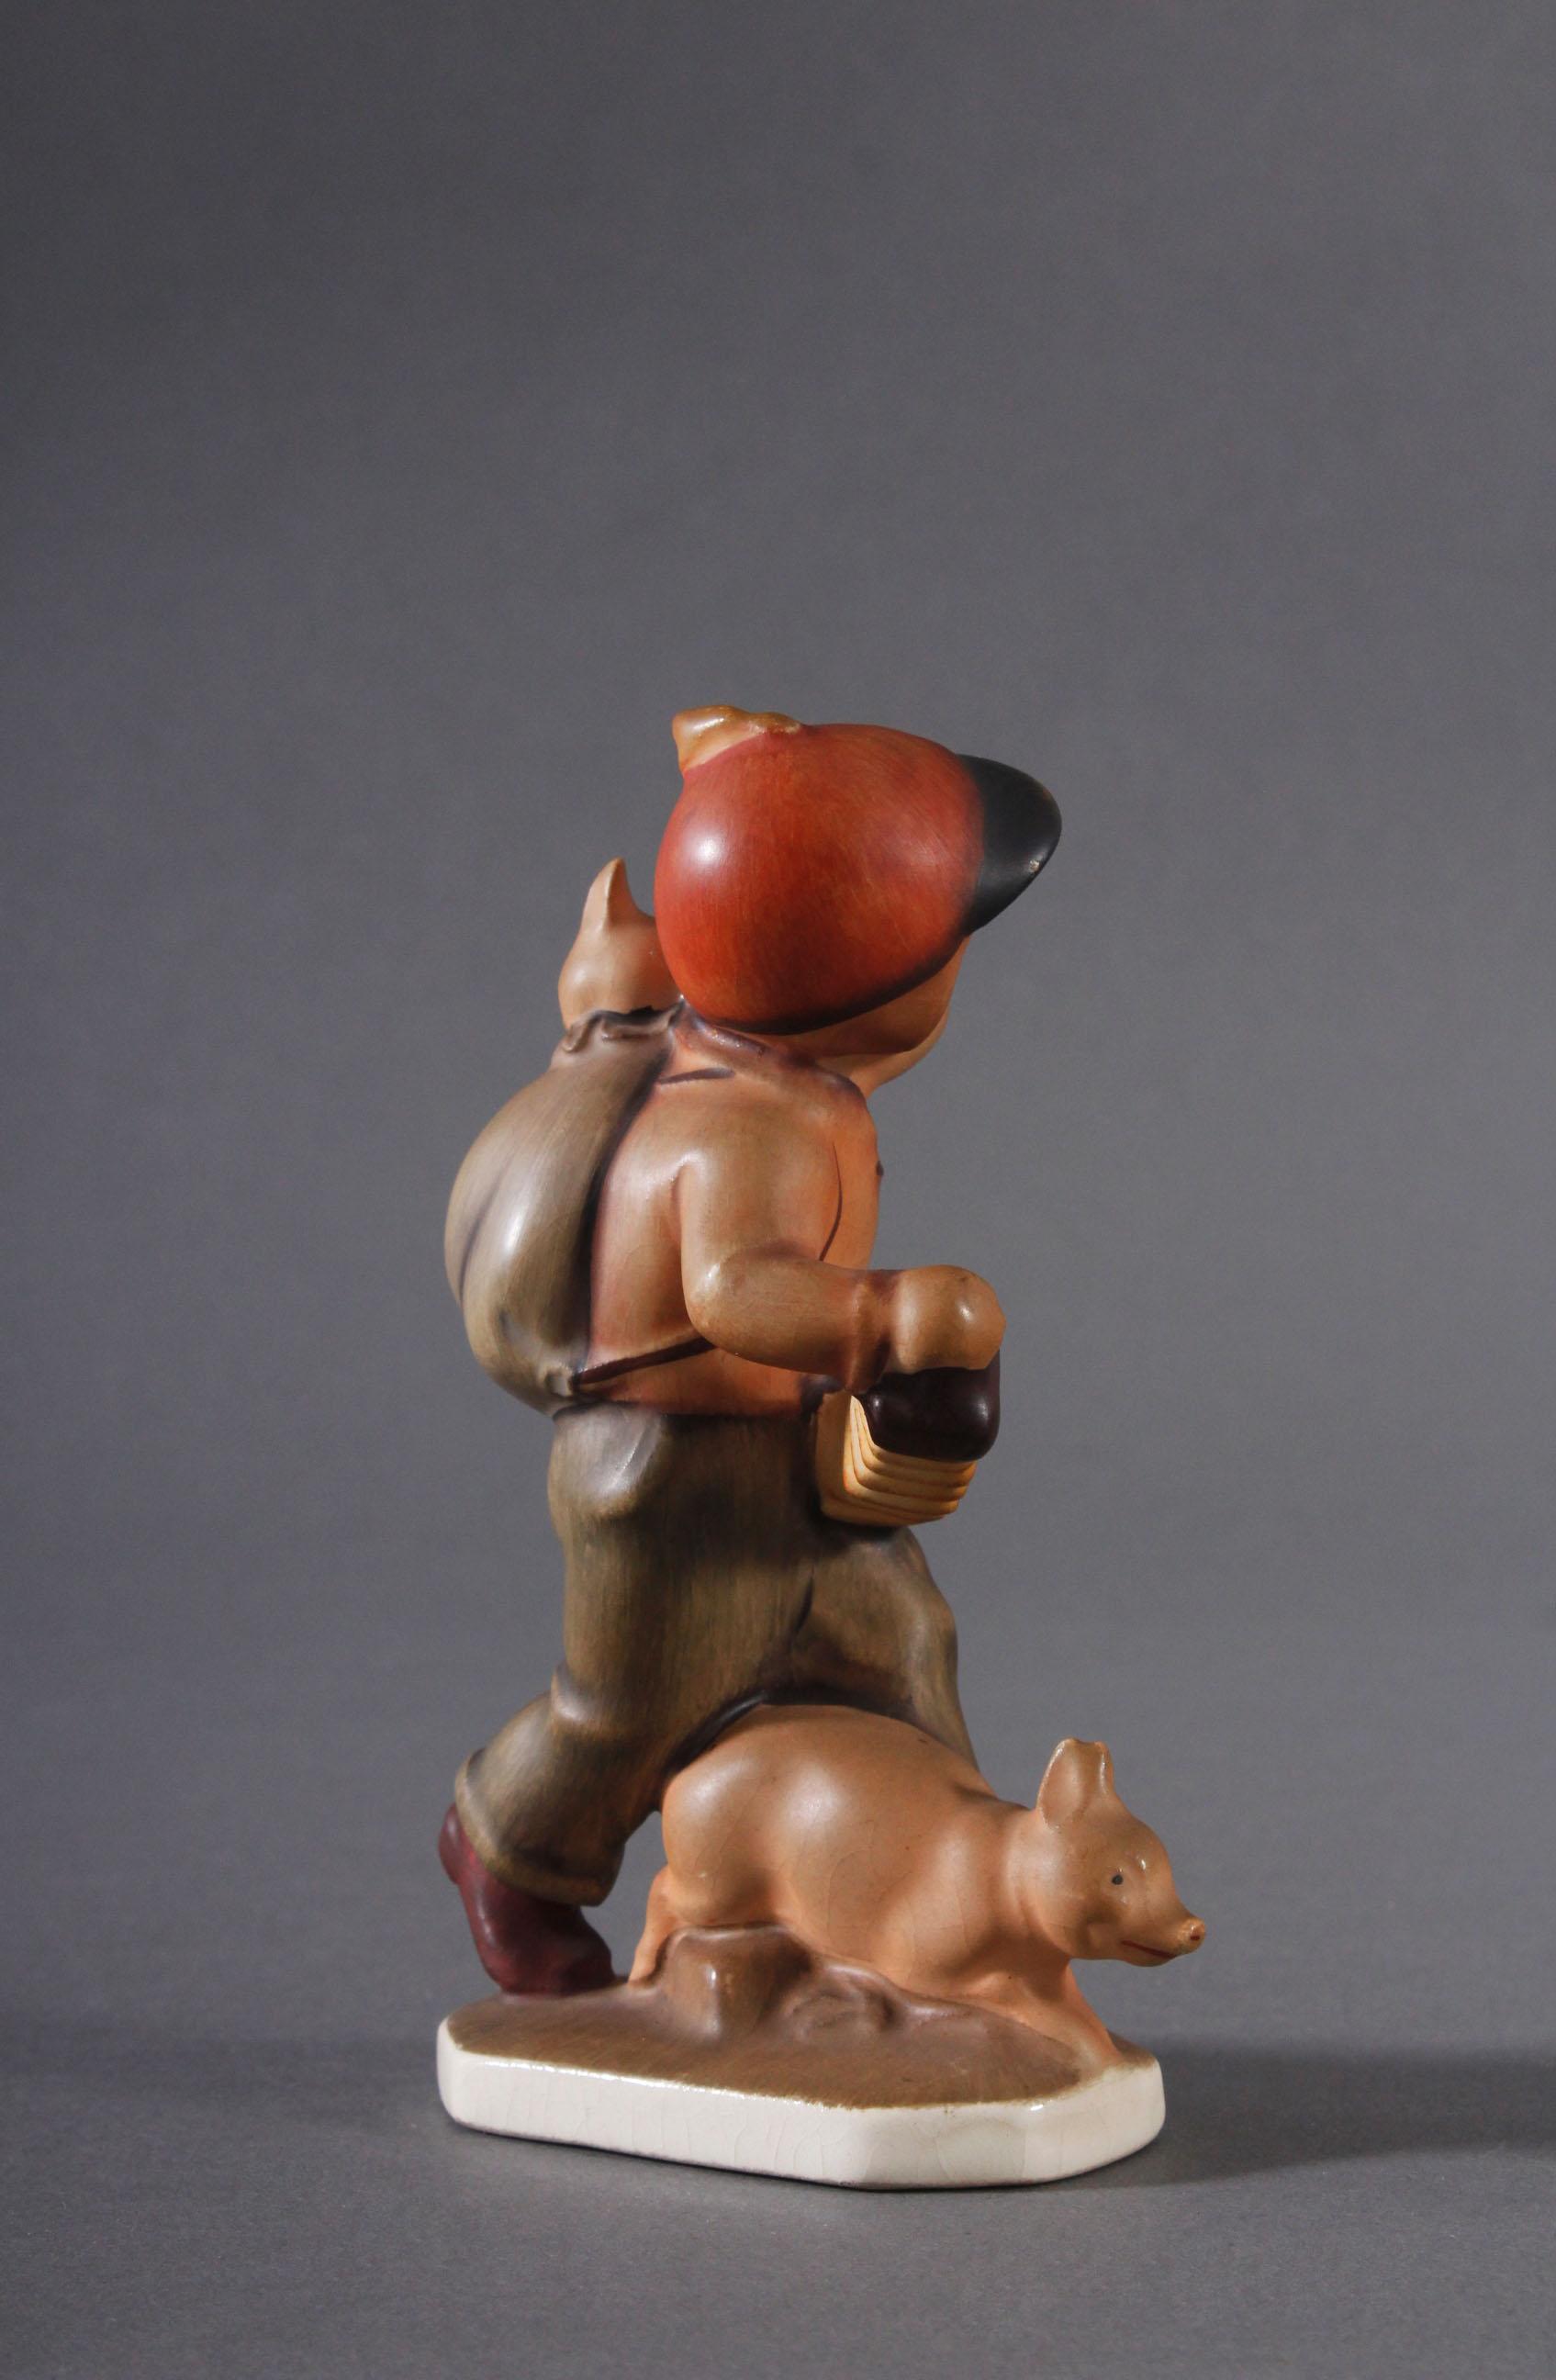 Hummelfigur 'Friedl' aus den 30er/40er Jahren-2